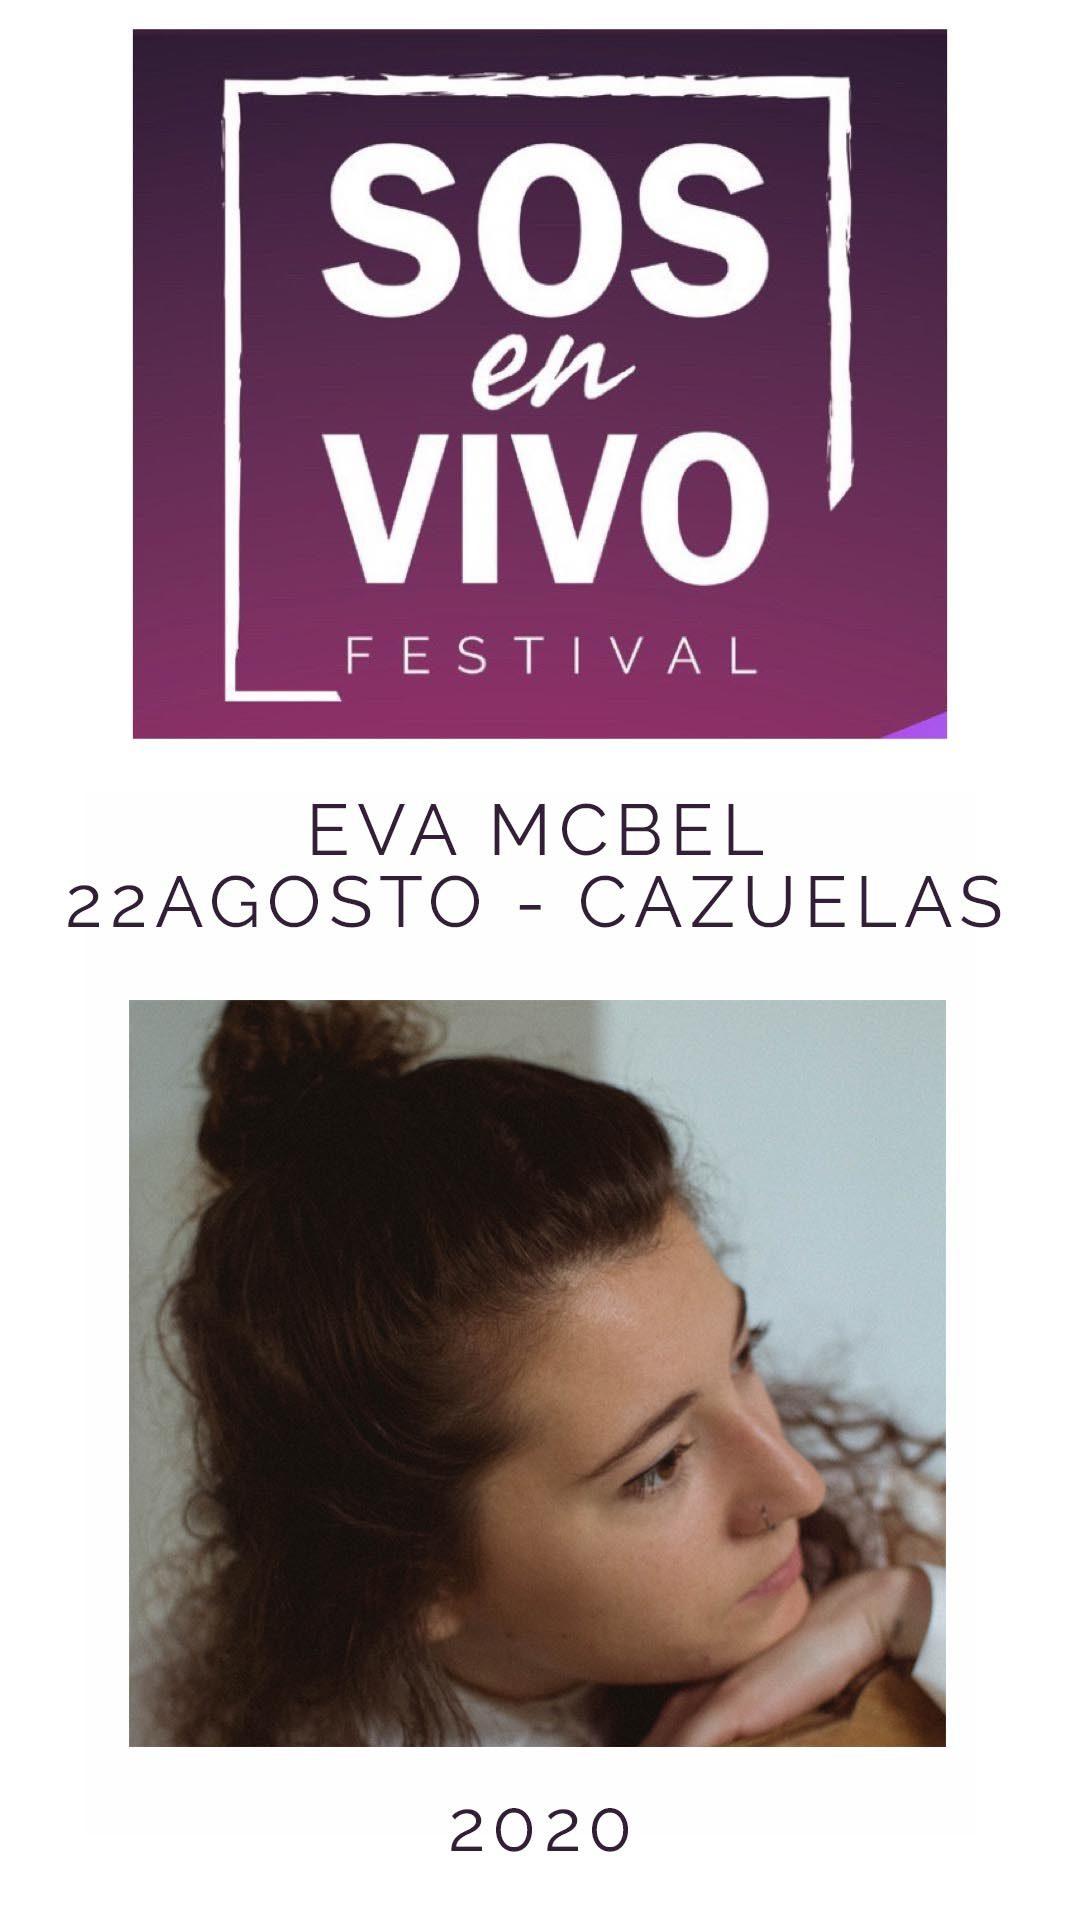 EVA MCBEL